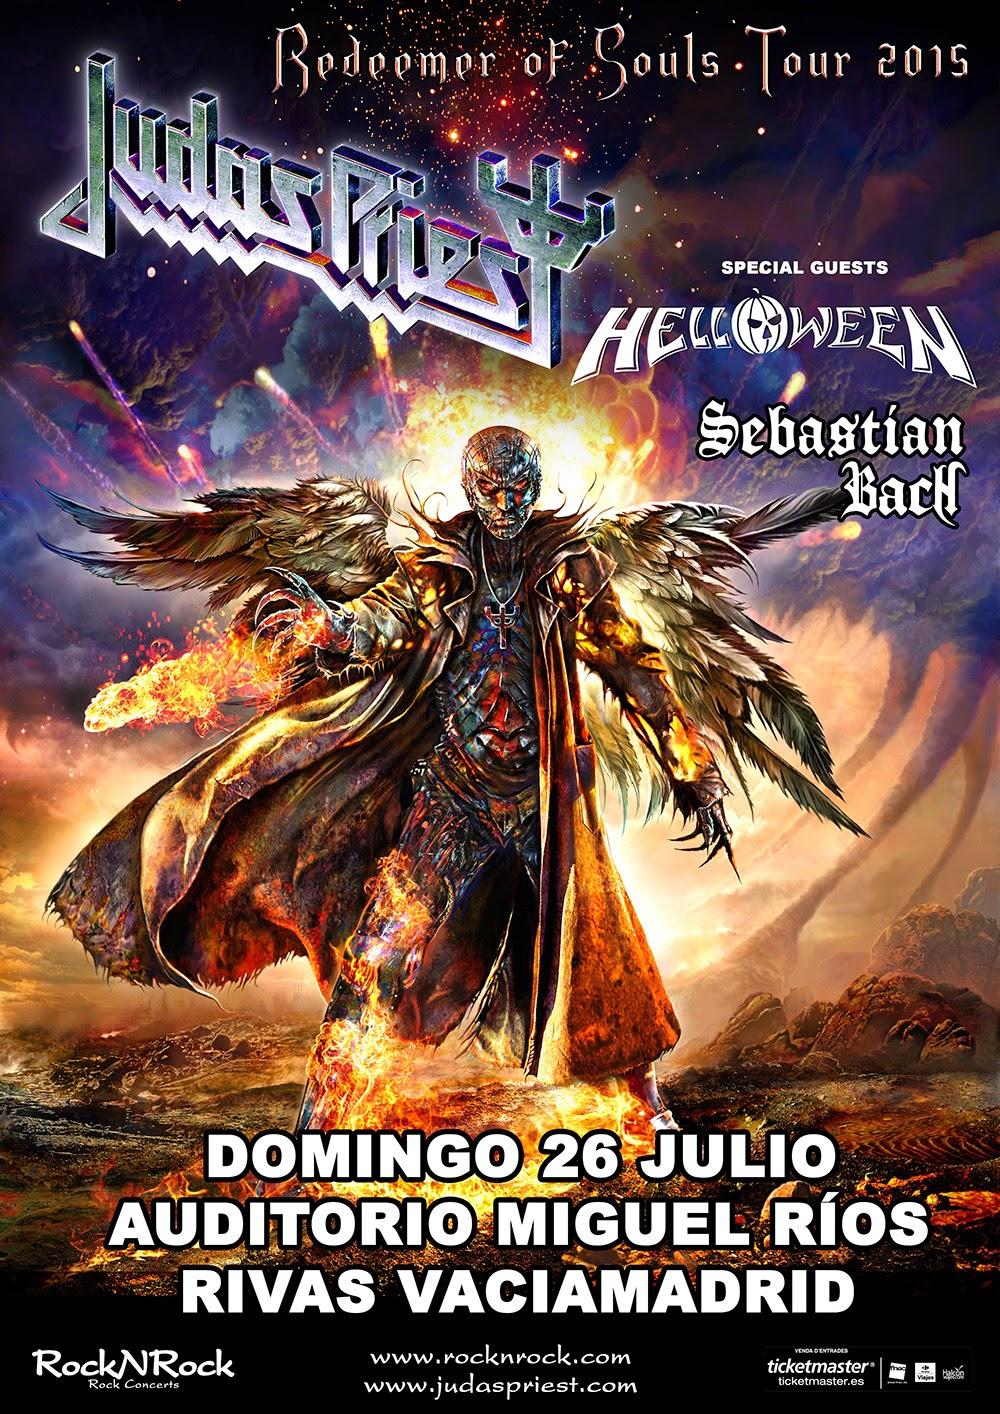 http://www.ticketmaster.es/es/entradas-musica/judas-priest-helloween-sebastian-bach/14869/